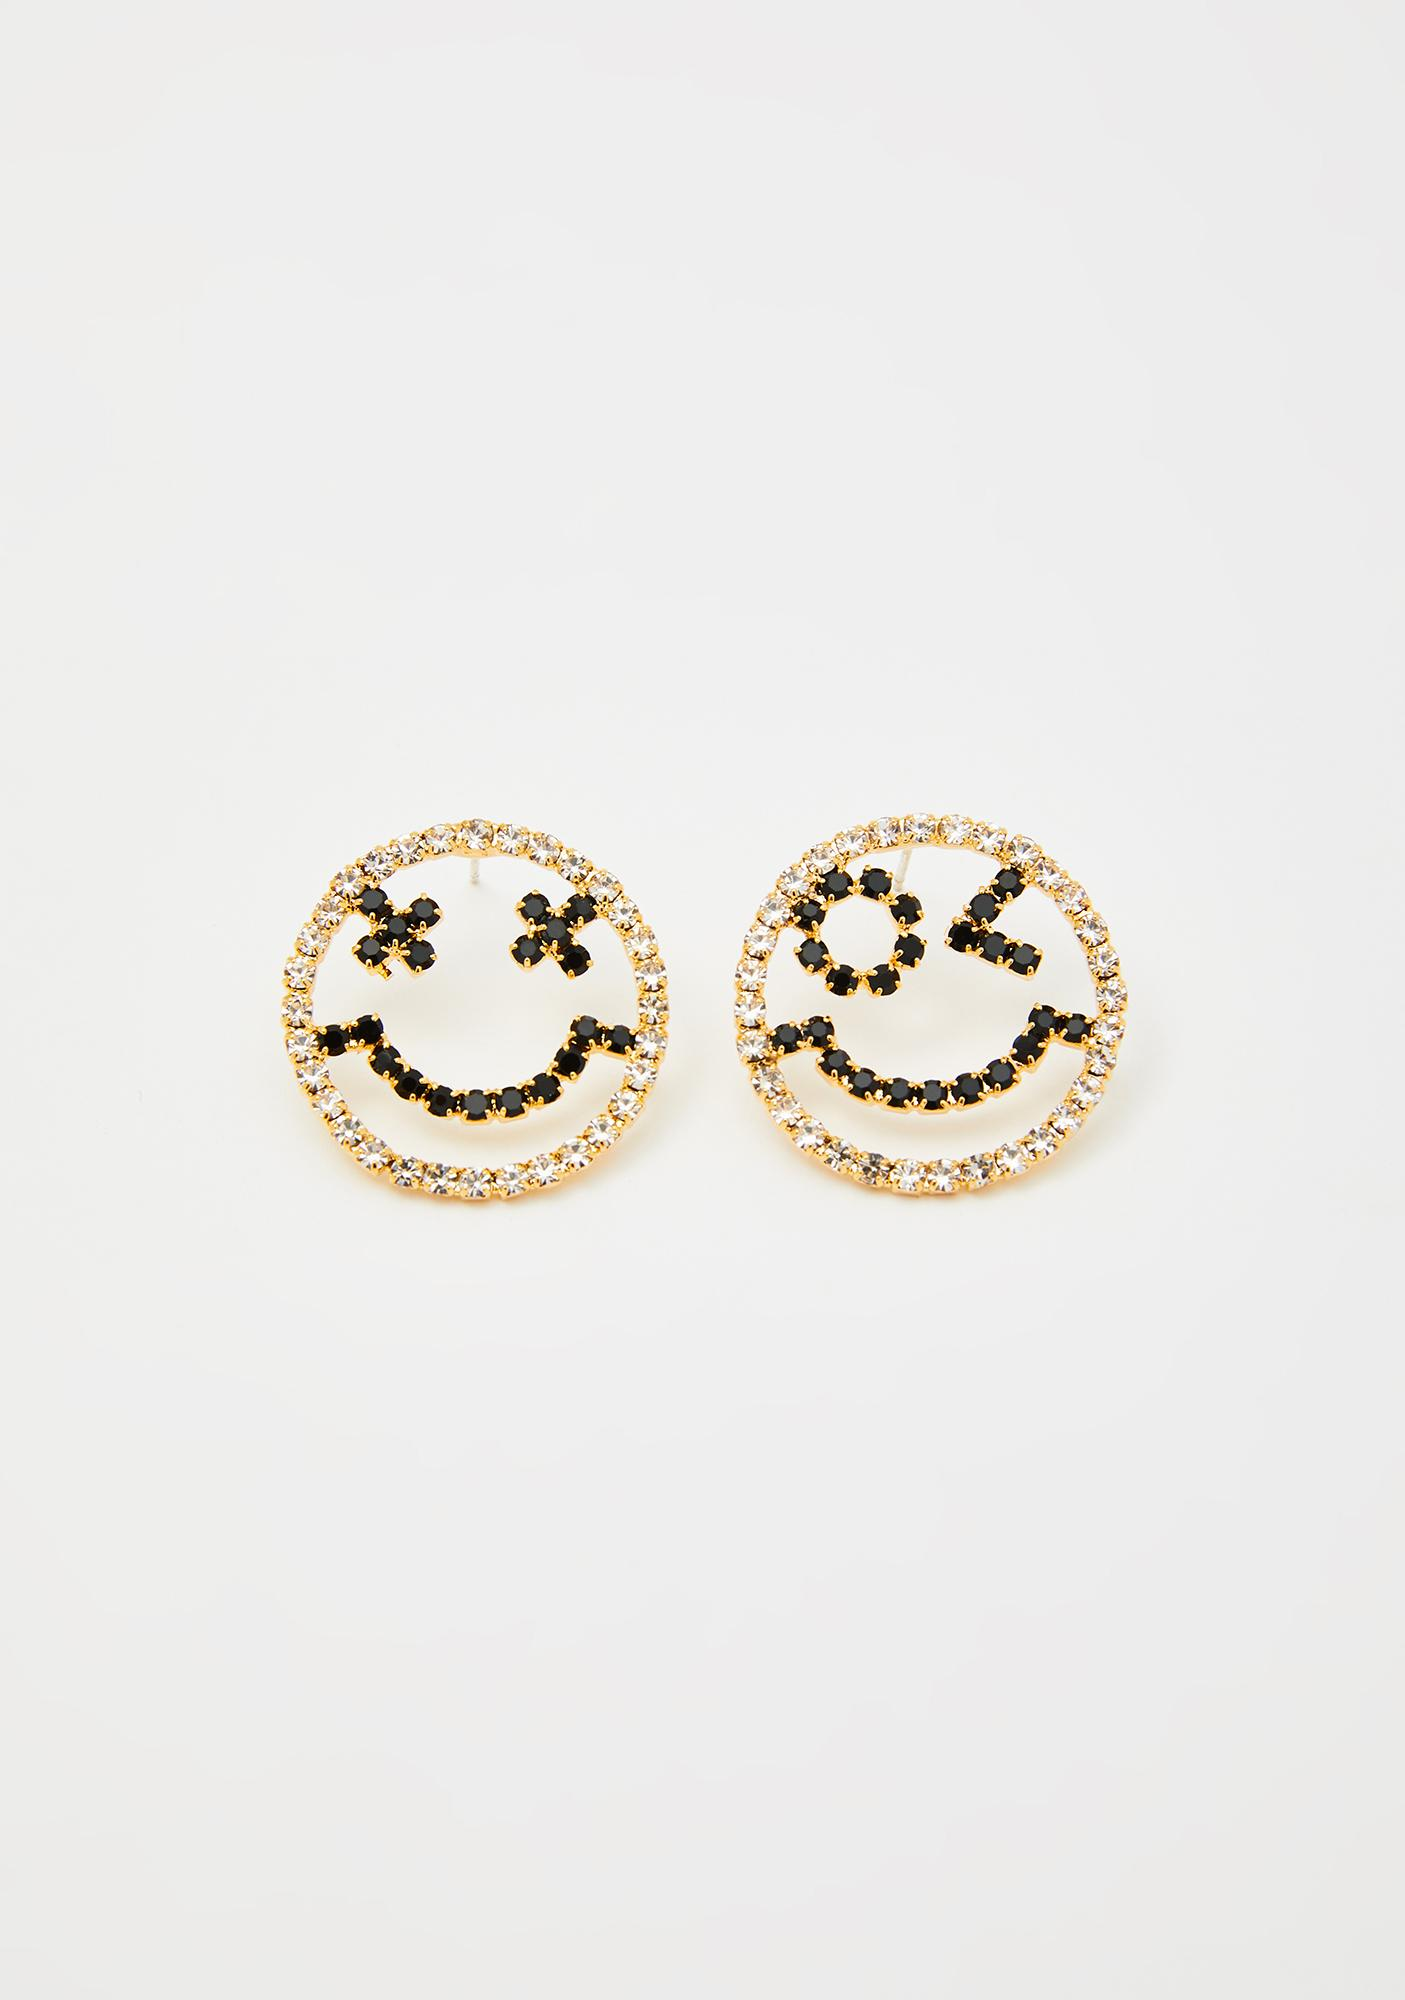 Manic Maniac Smiley Earrings